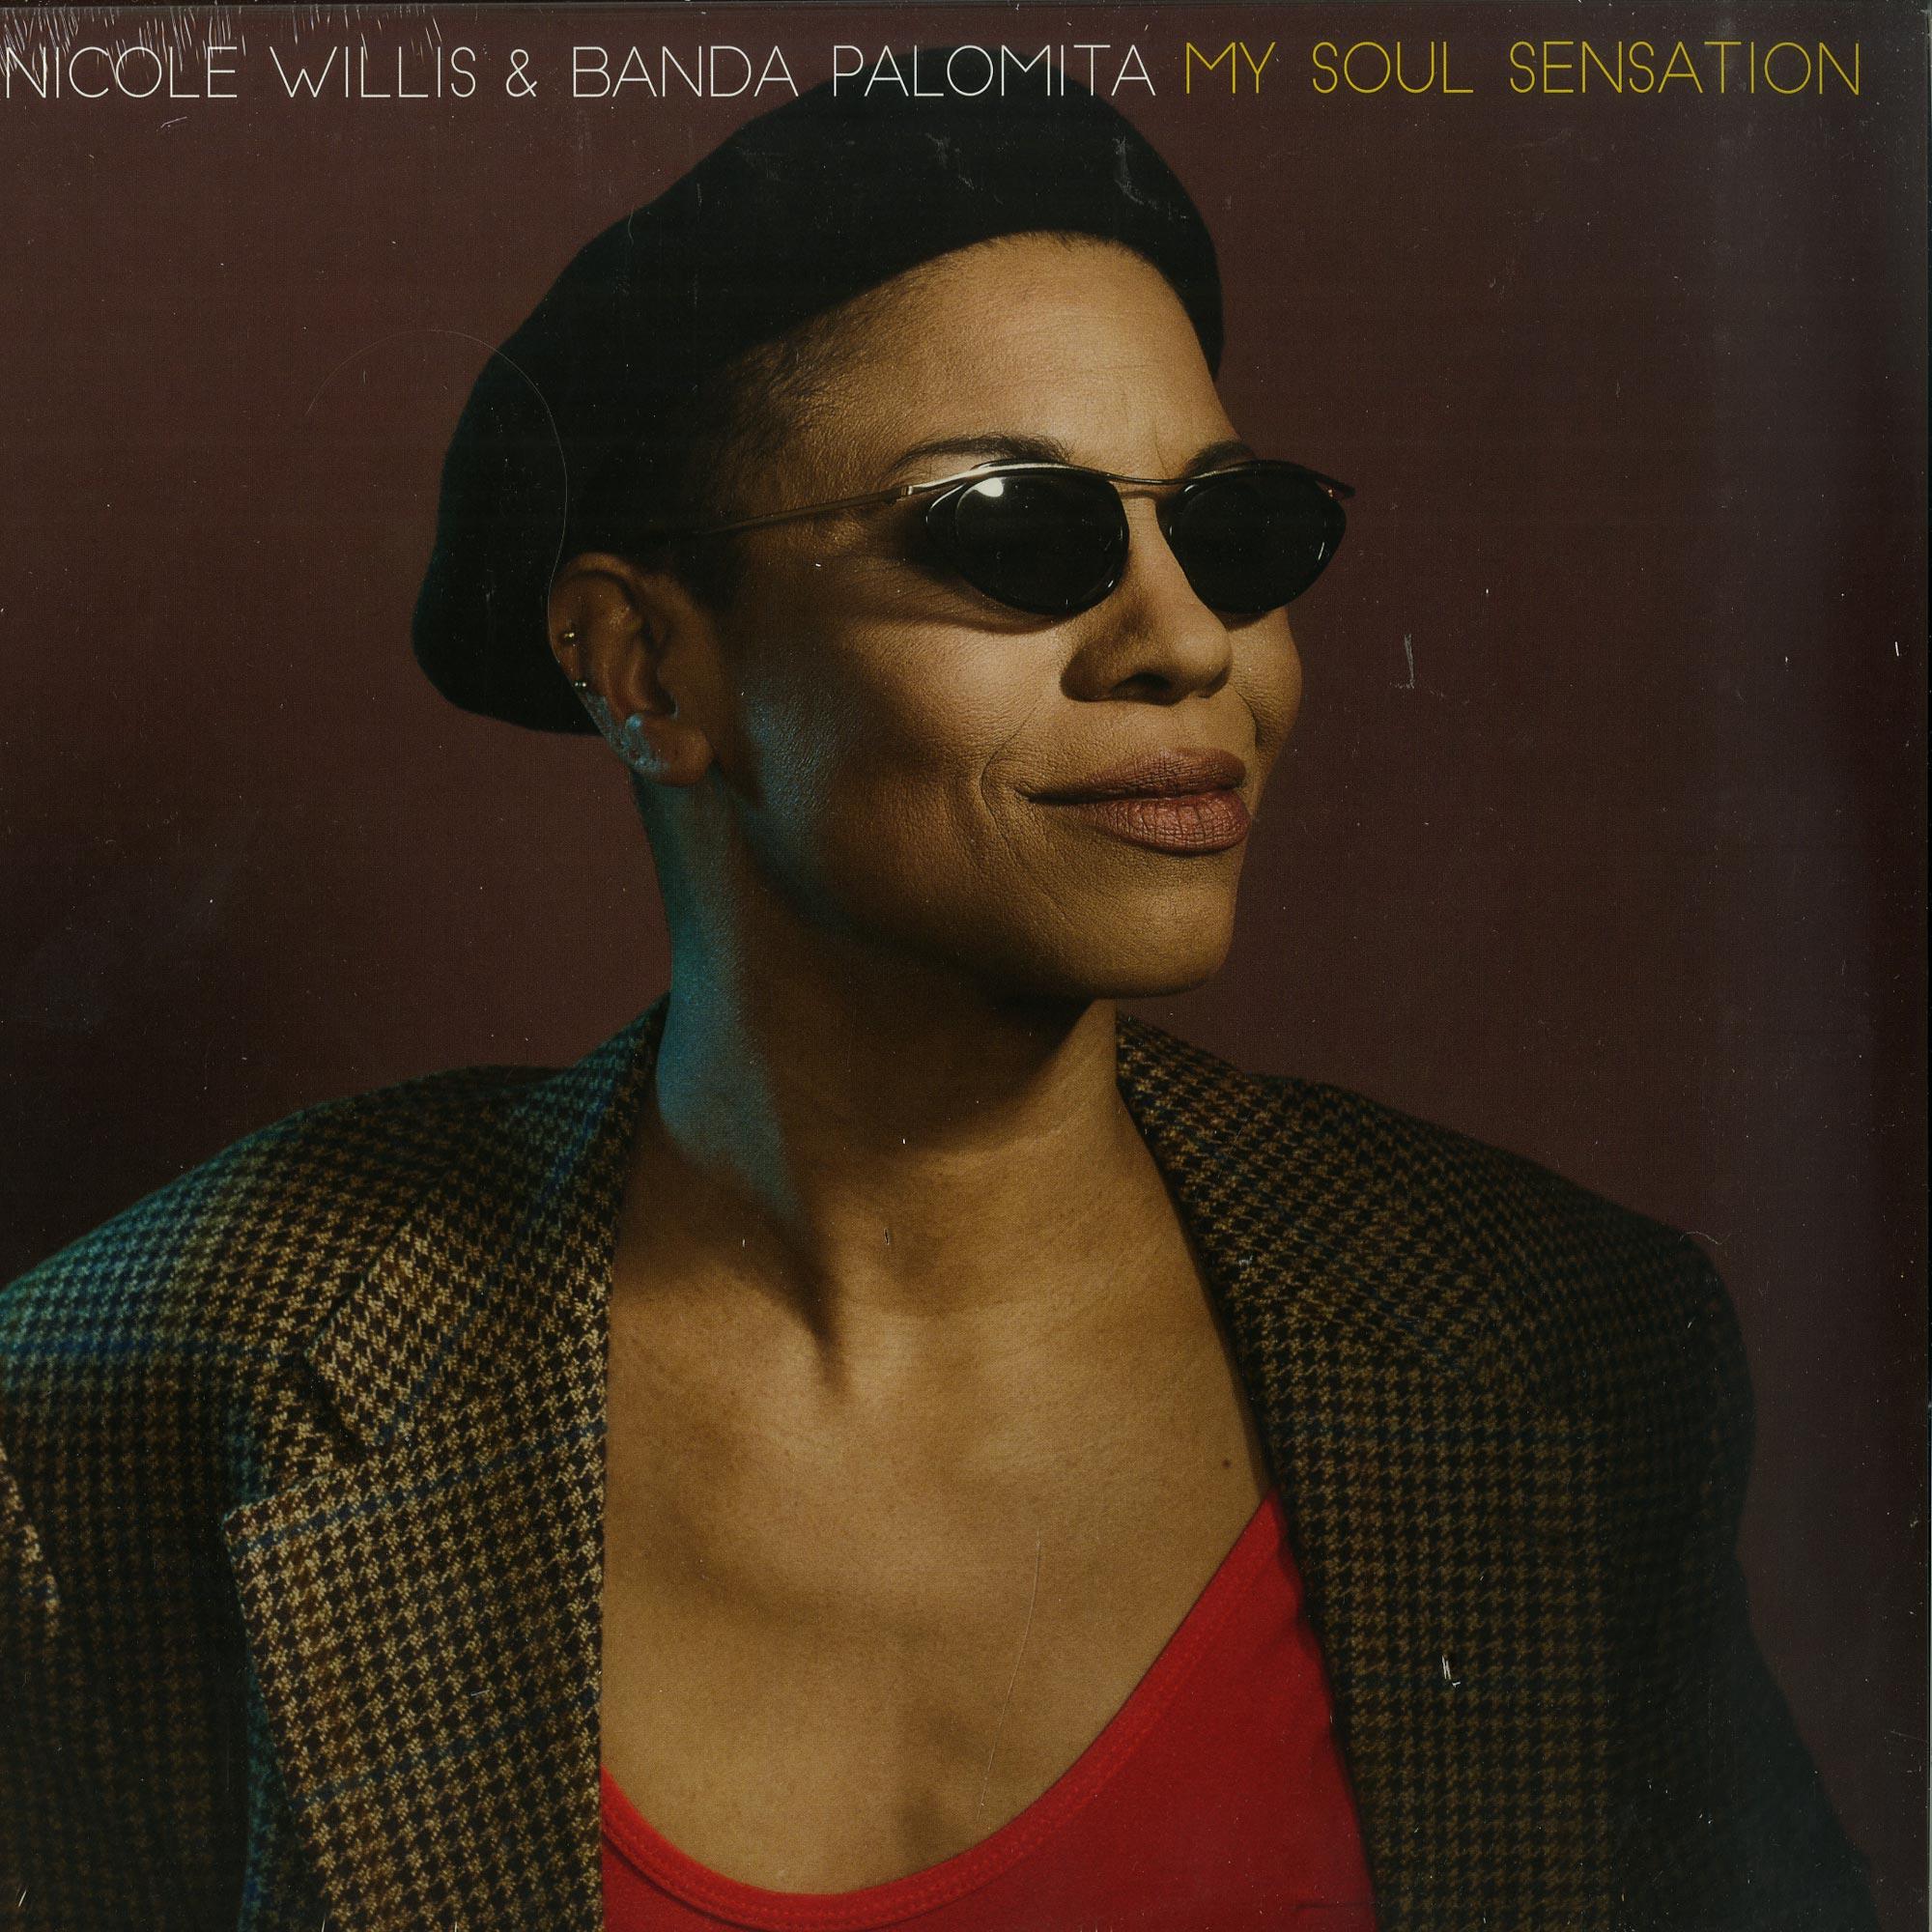 Nicole Willis & Banda Palomita - MY SOUL SENSATION